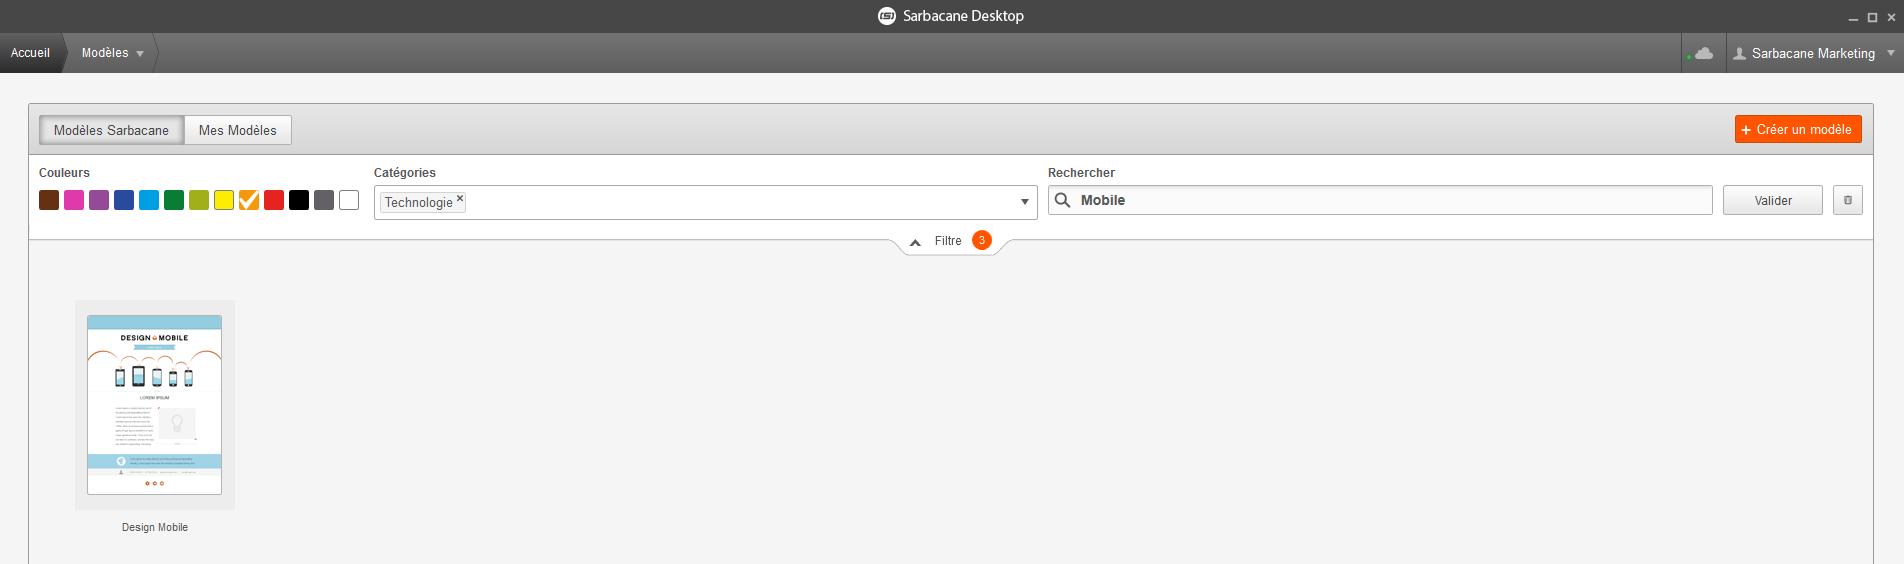 filtre templates emailing Sarbacane Desktop